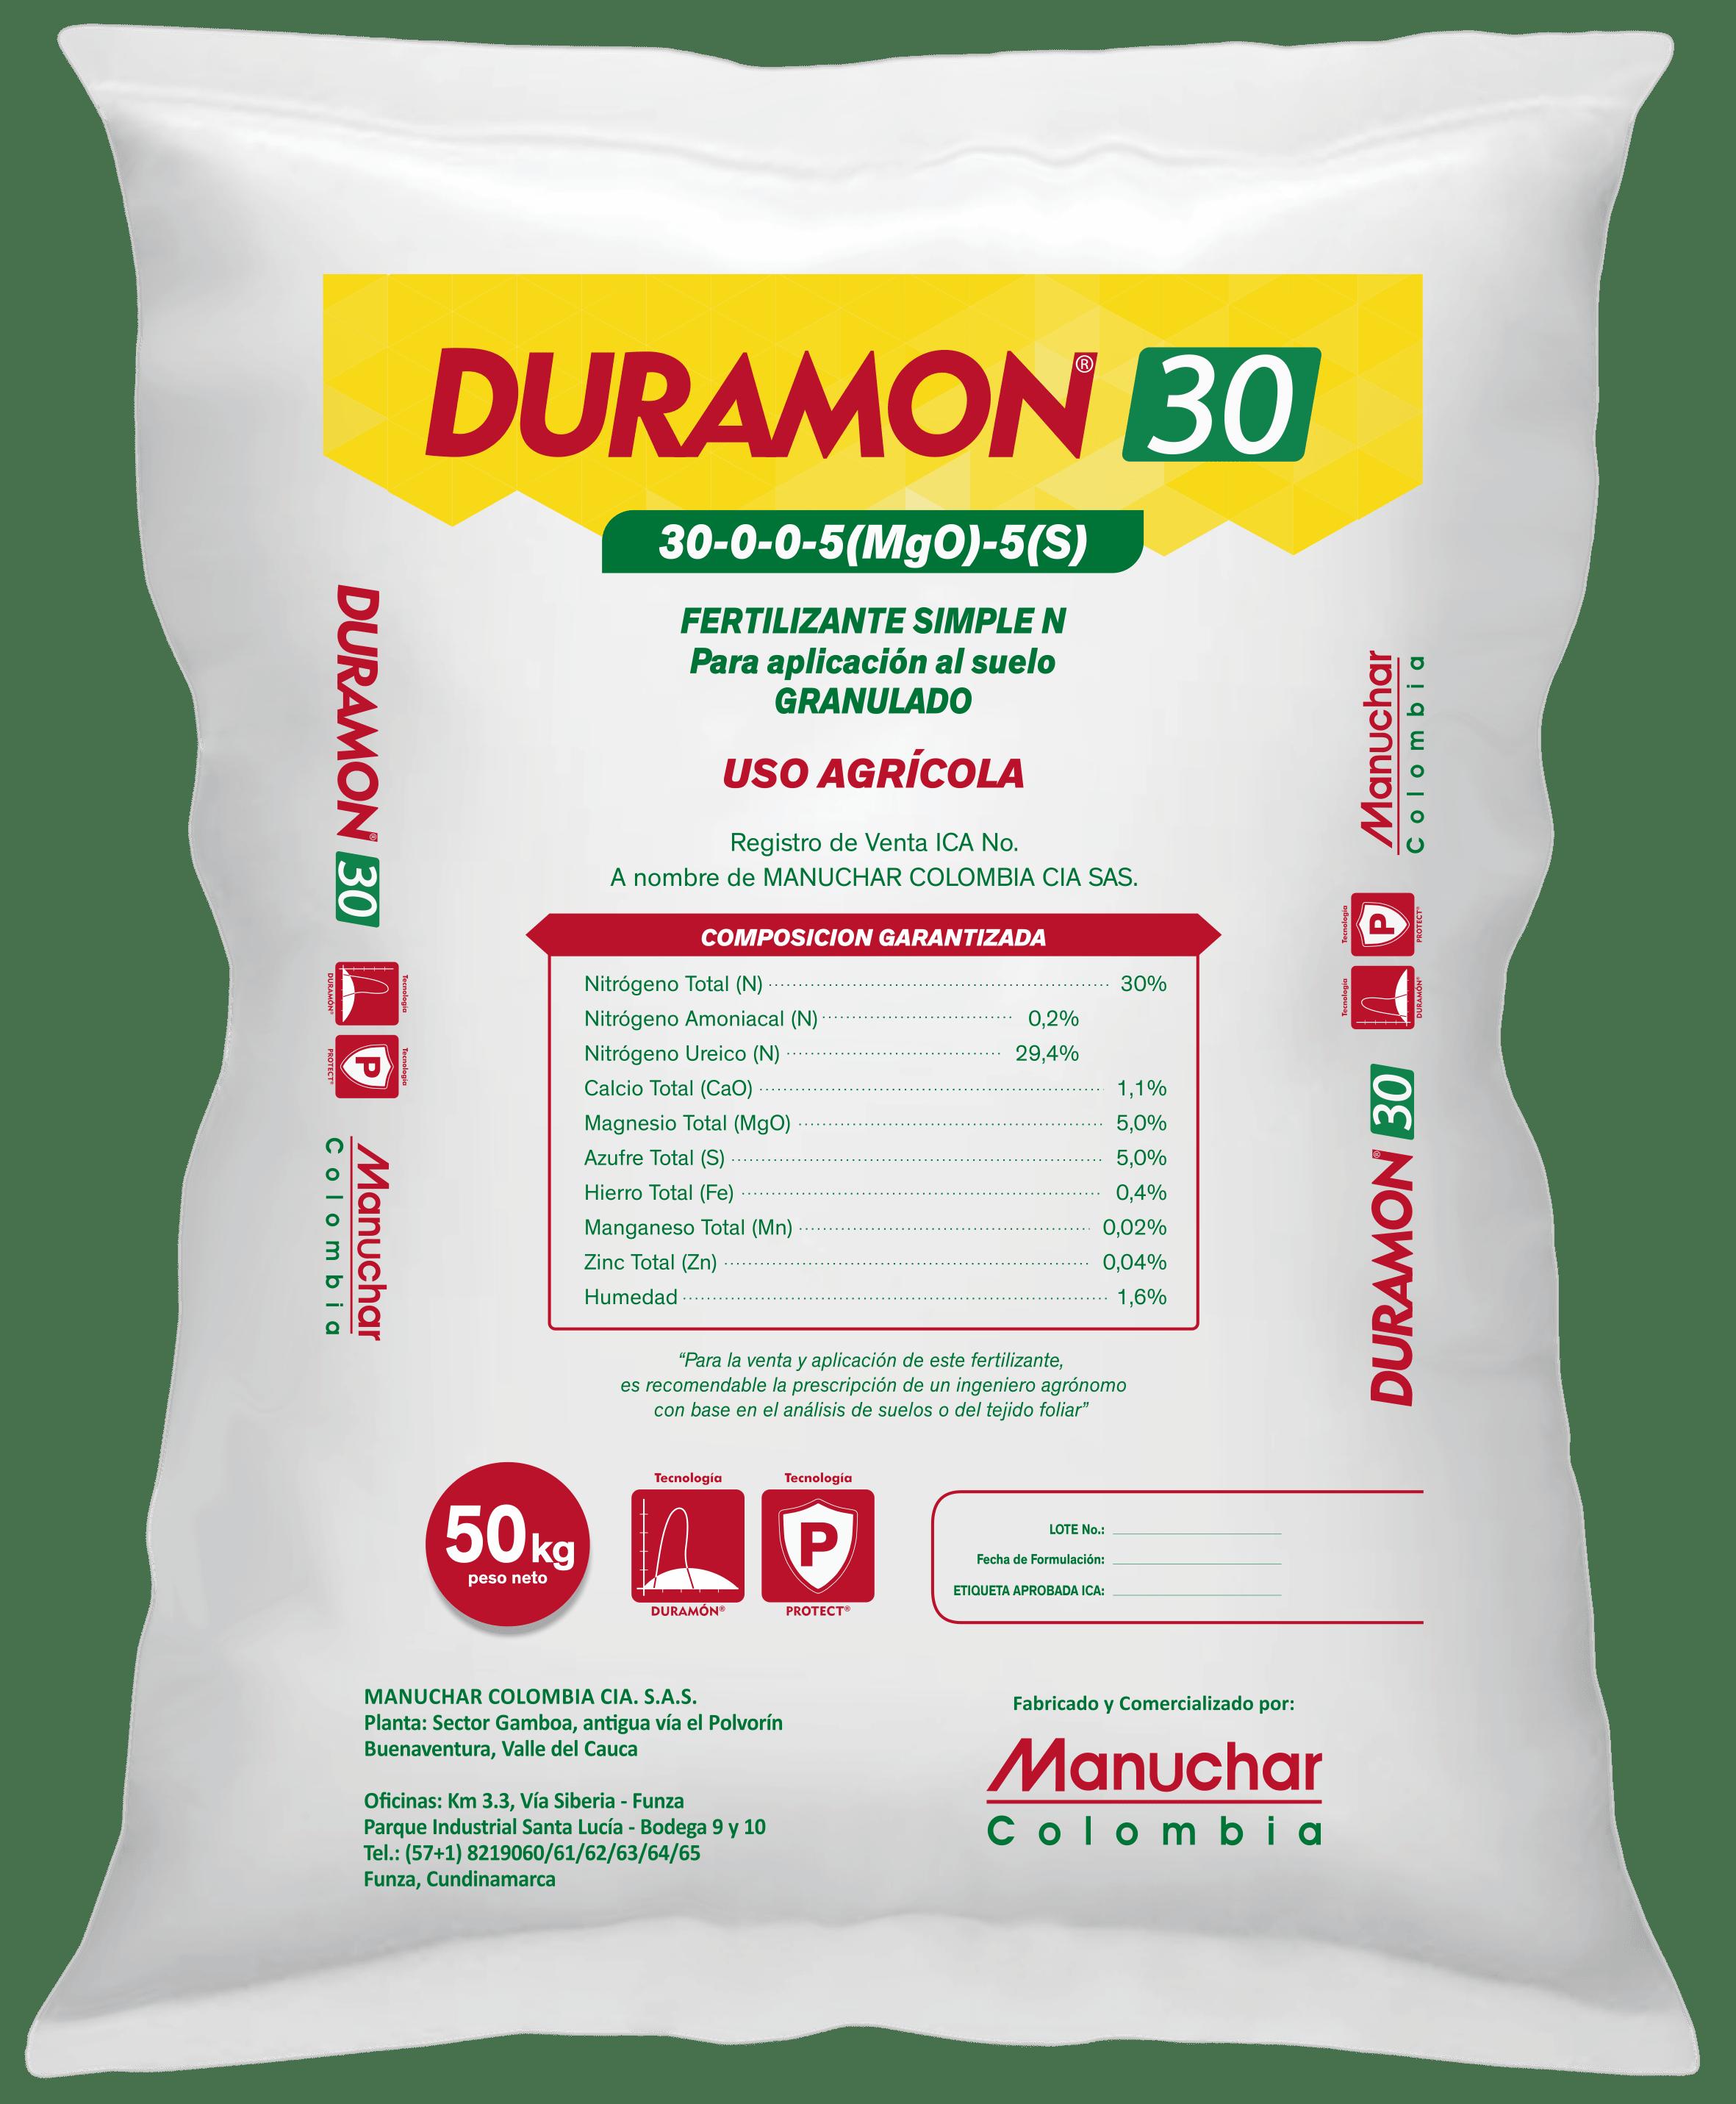 duramon-30-min.png